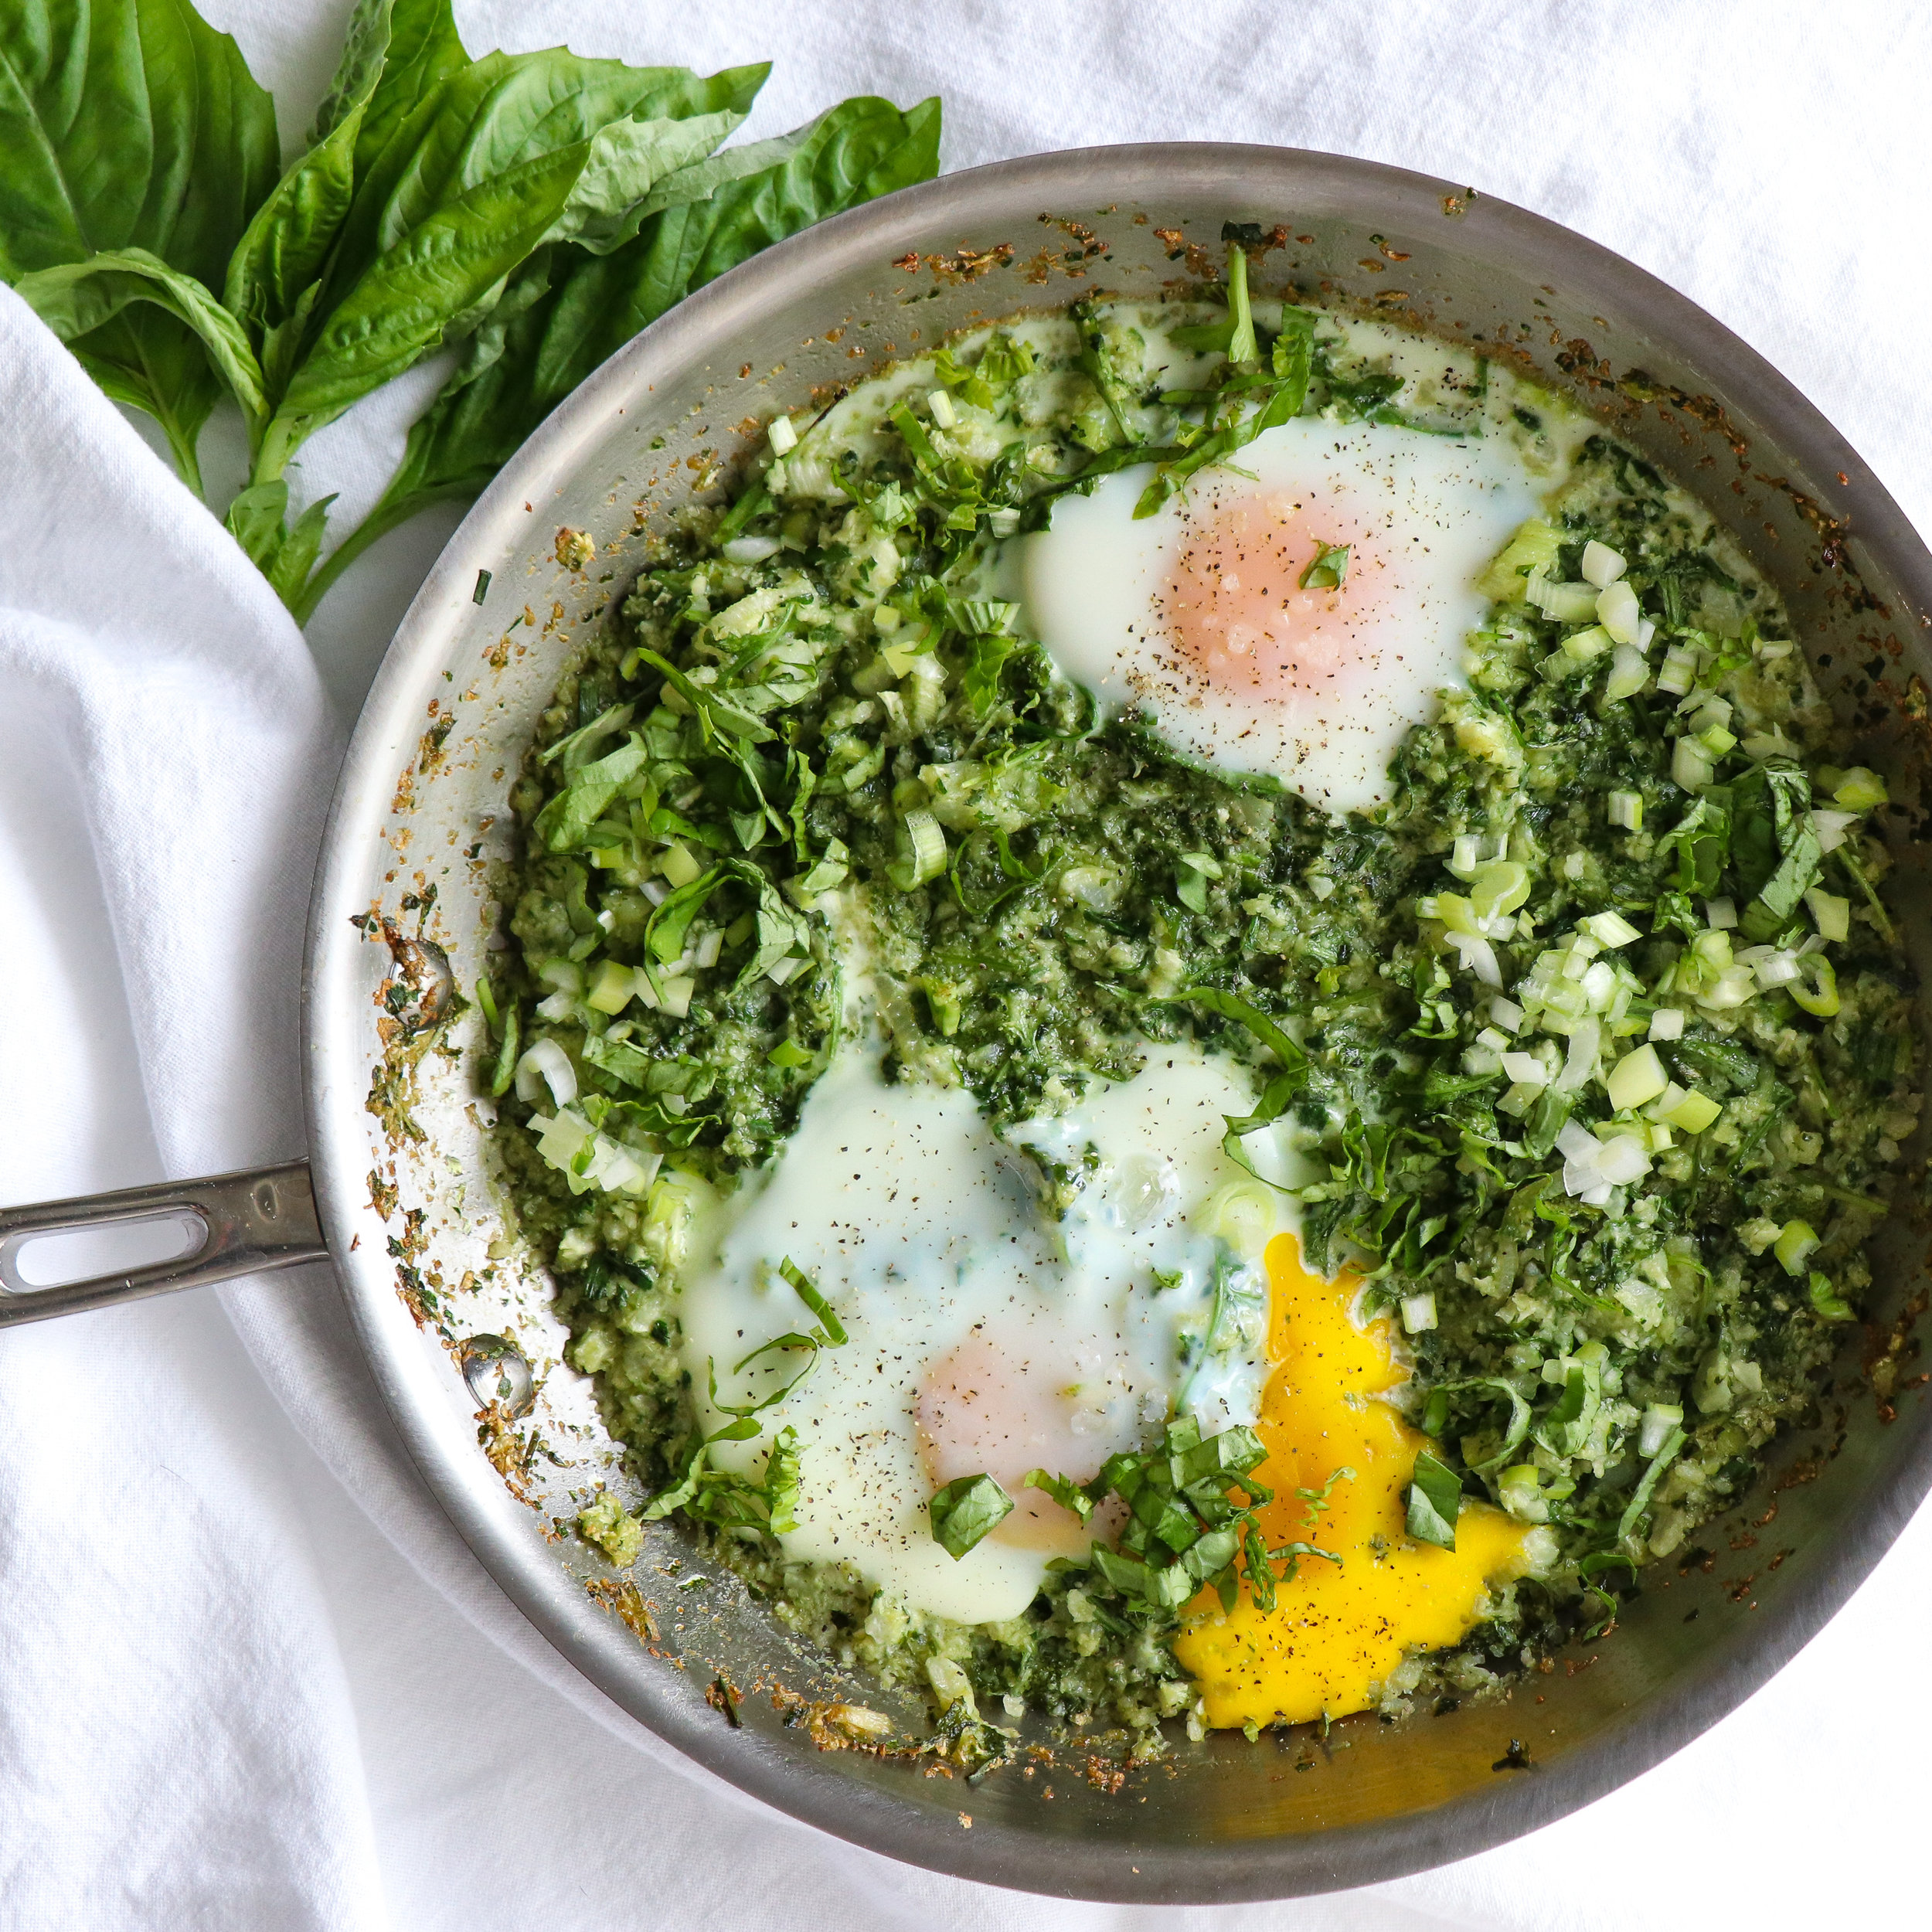 cauli herb egg bake 1 - cropped.jpg